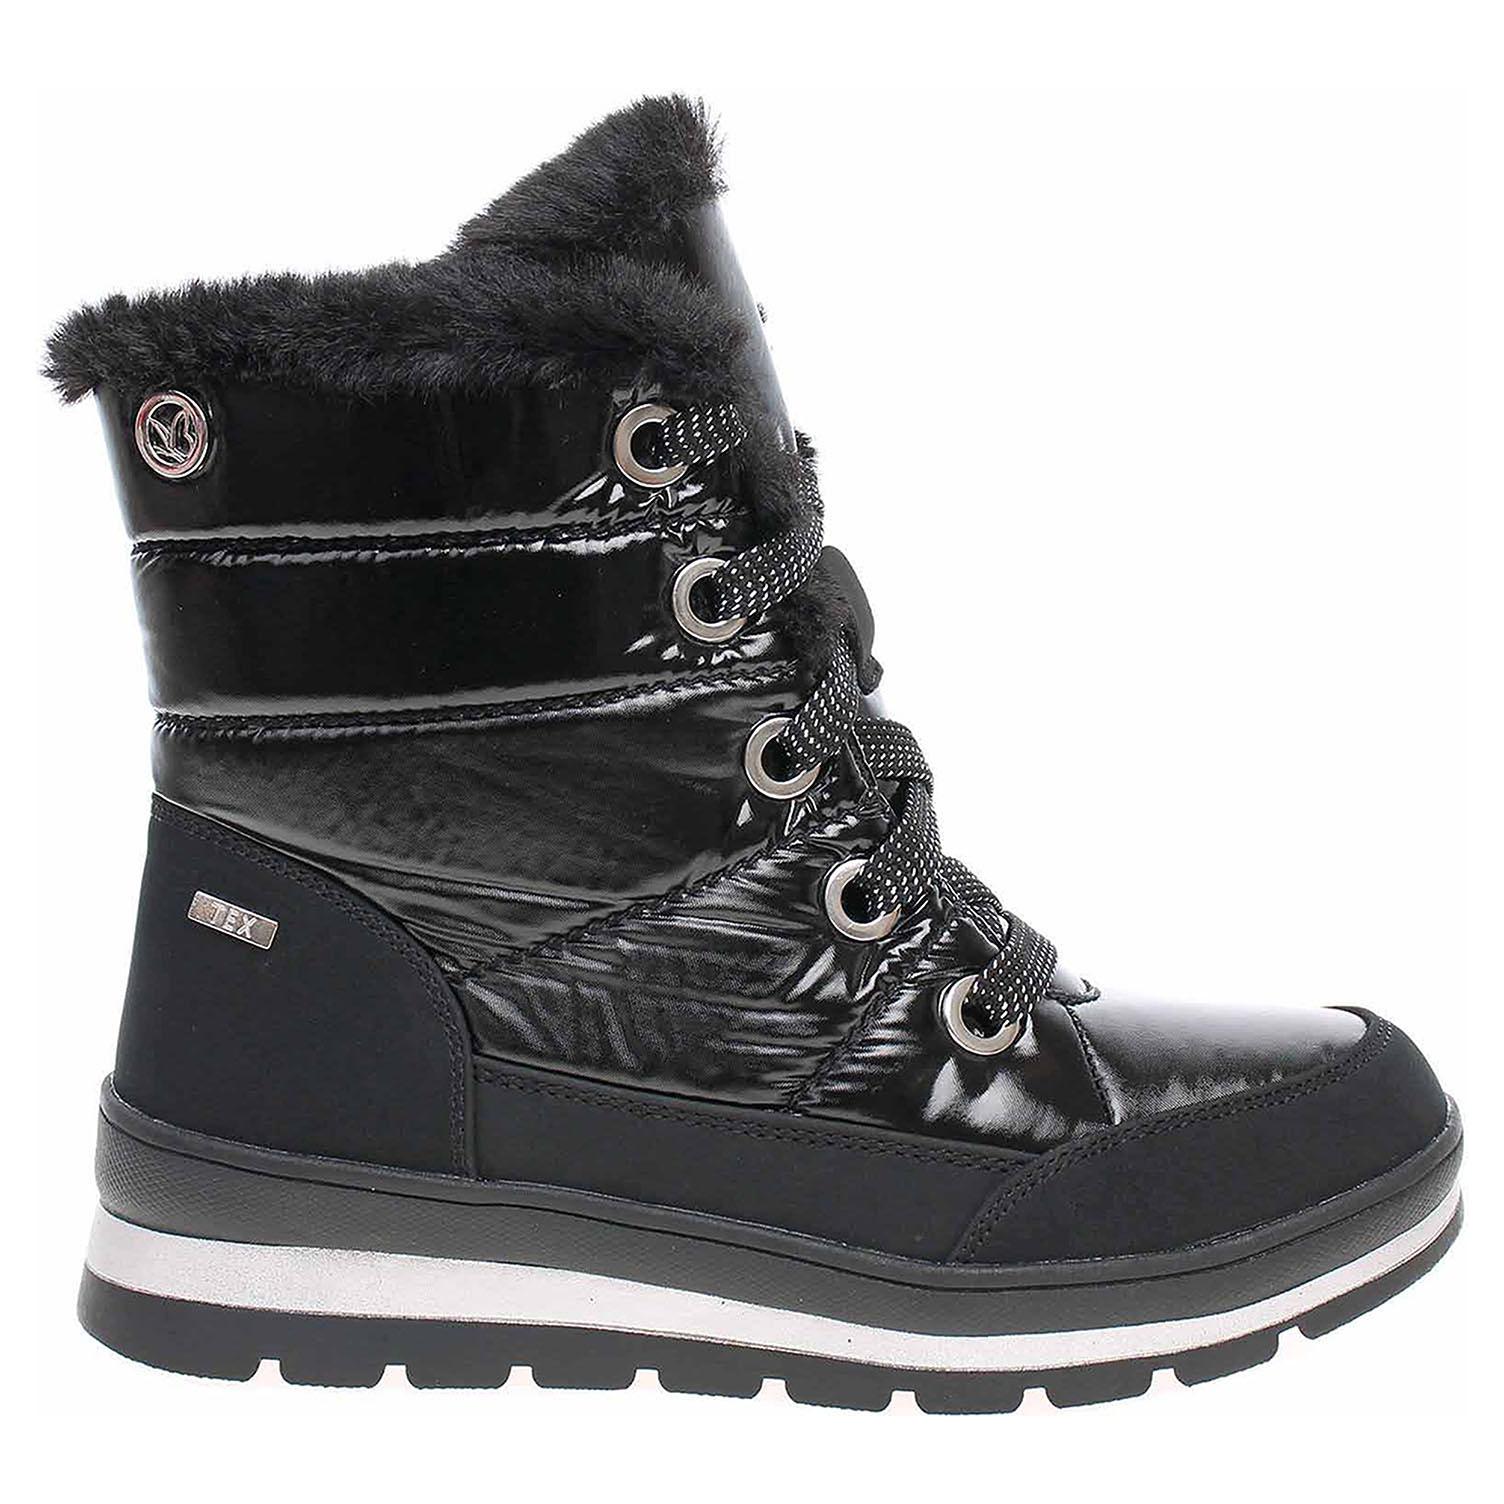 Ecco Caprice dámská obuv 9-26221-21 black comb 22400745 9c4e7e48f6e